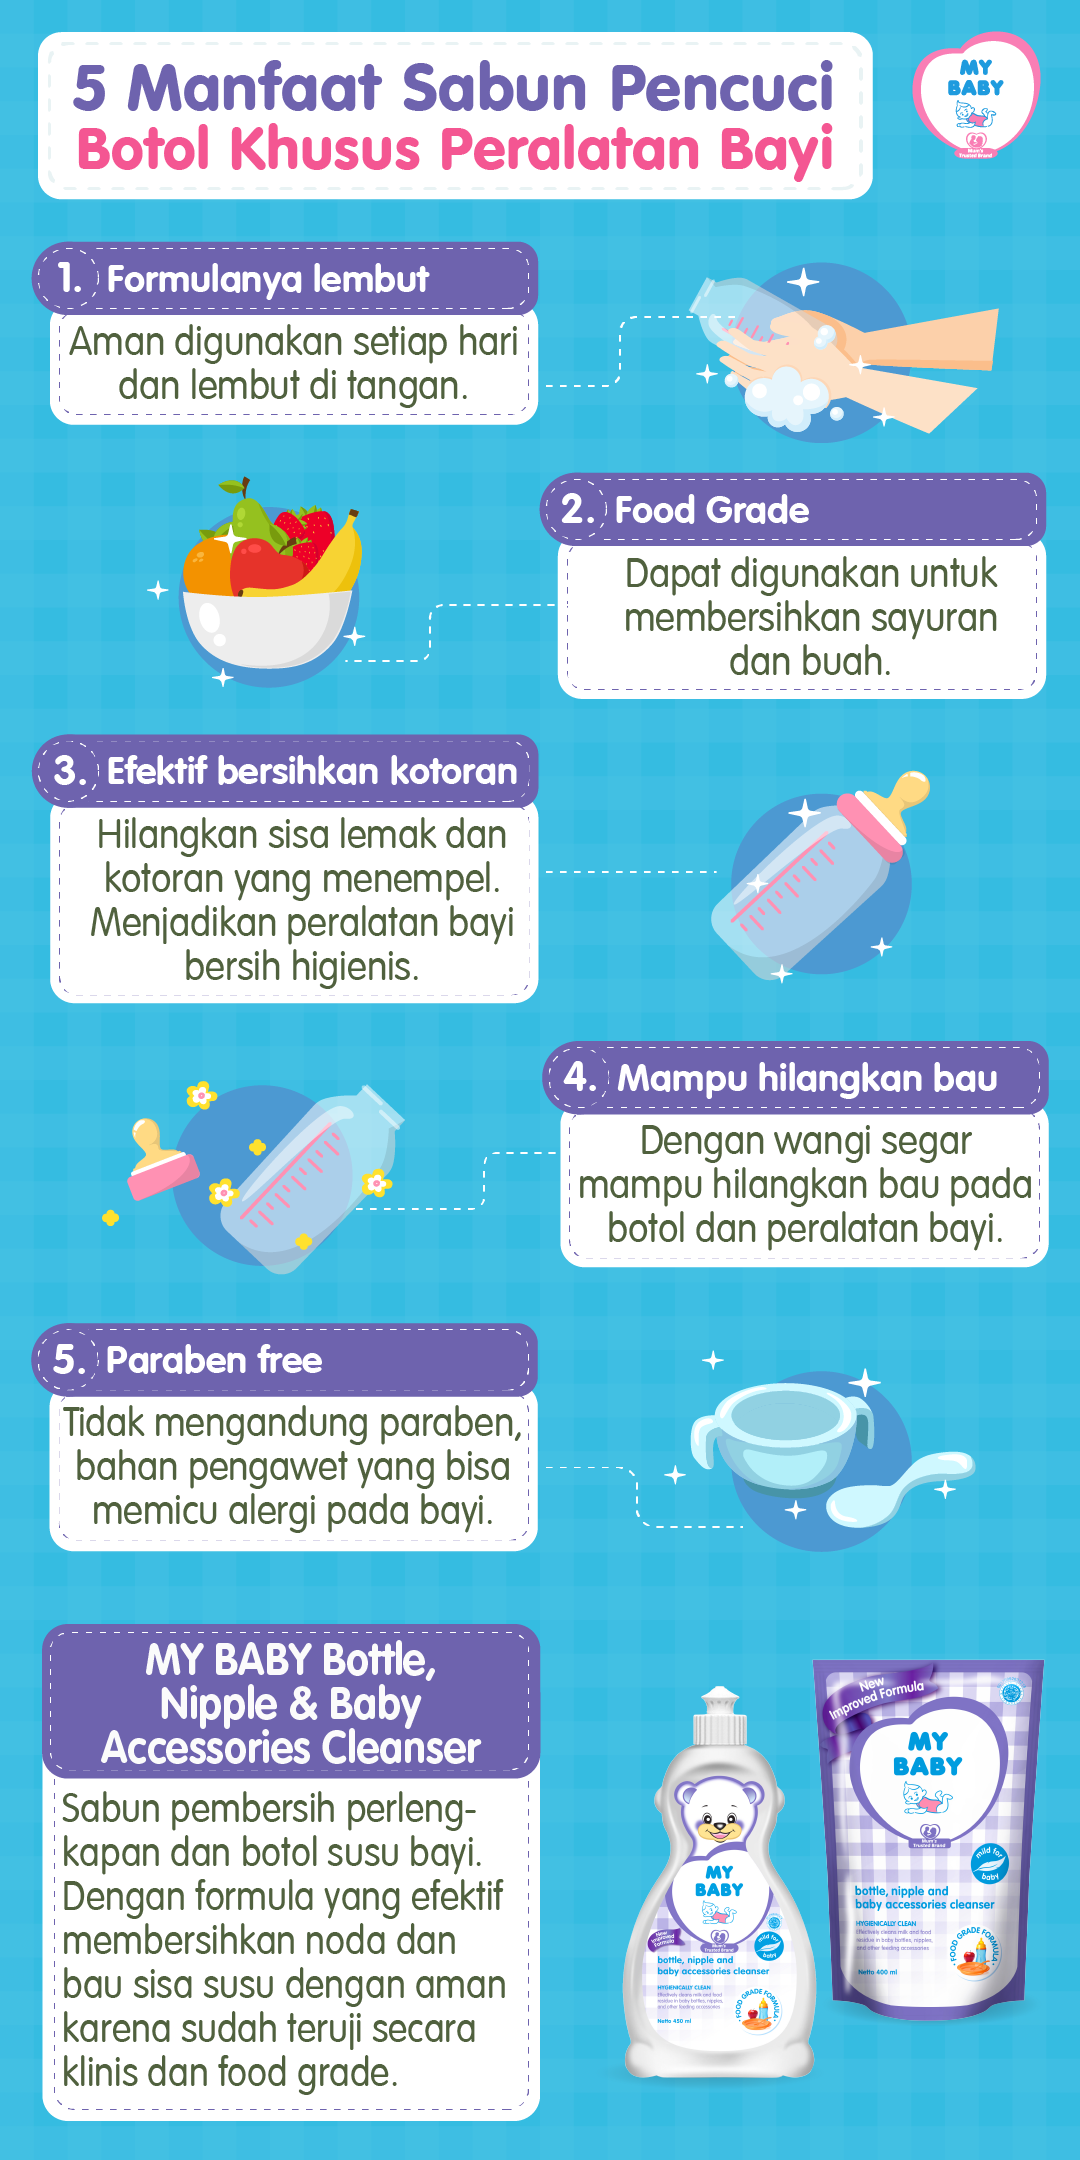 5 Manfaat Sabun Pencuci Botol Khusus Peralatan Bayi